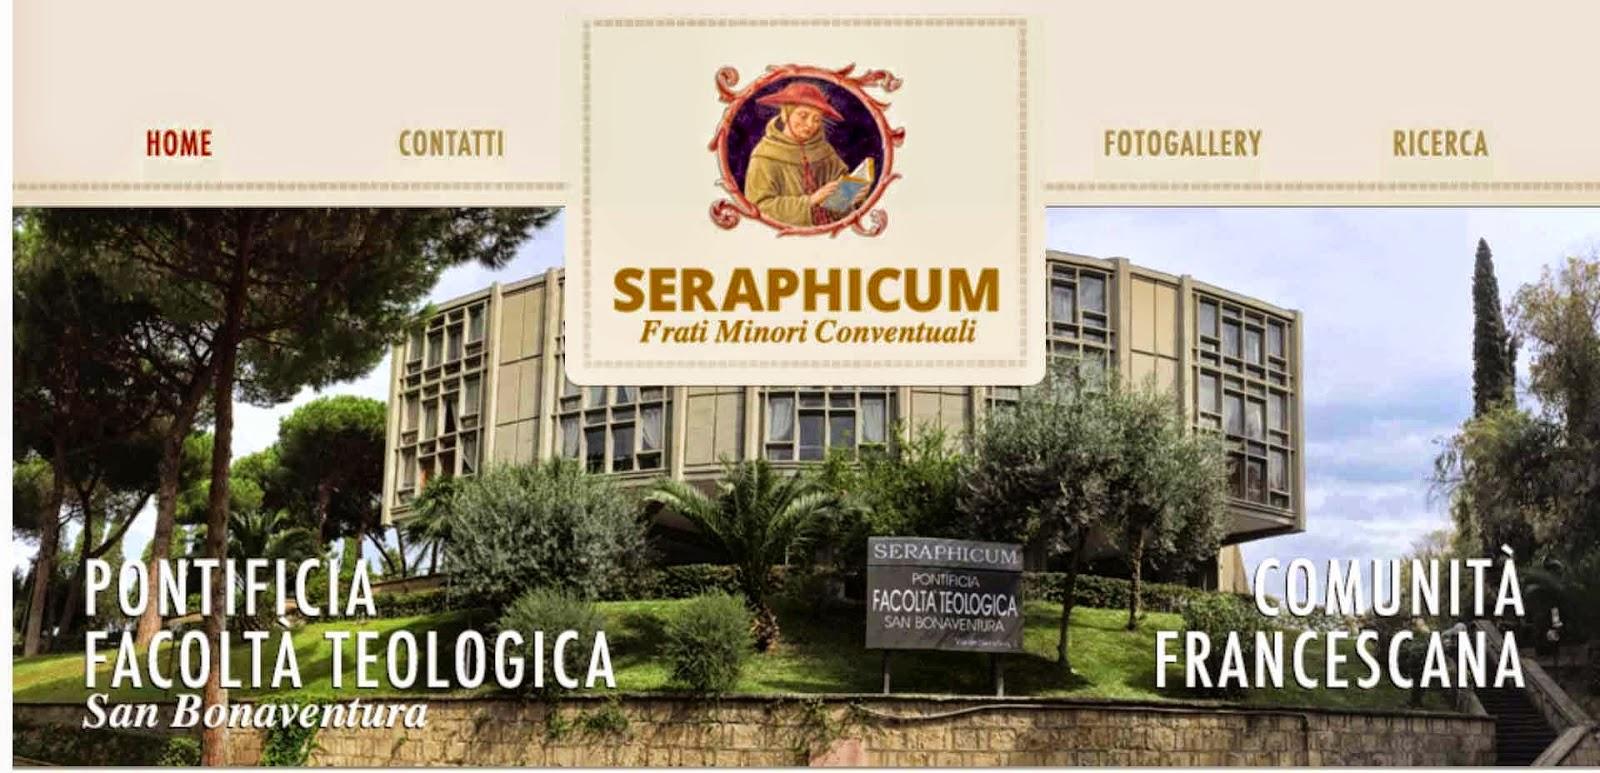 Pontificia Facoltà Teologica San Bonaventura